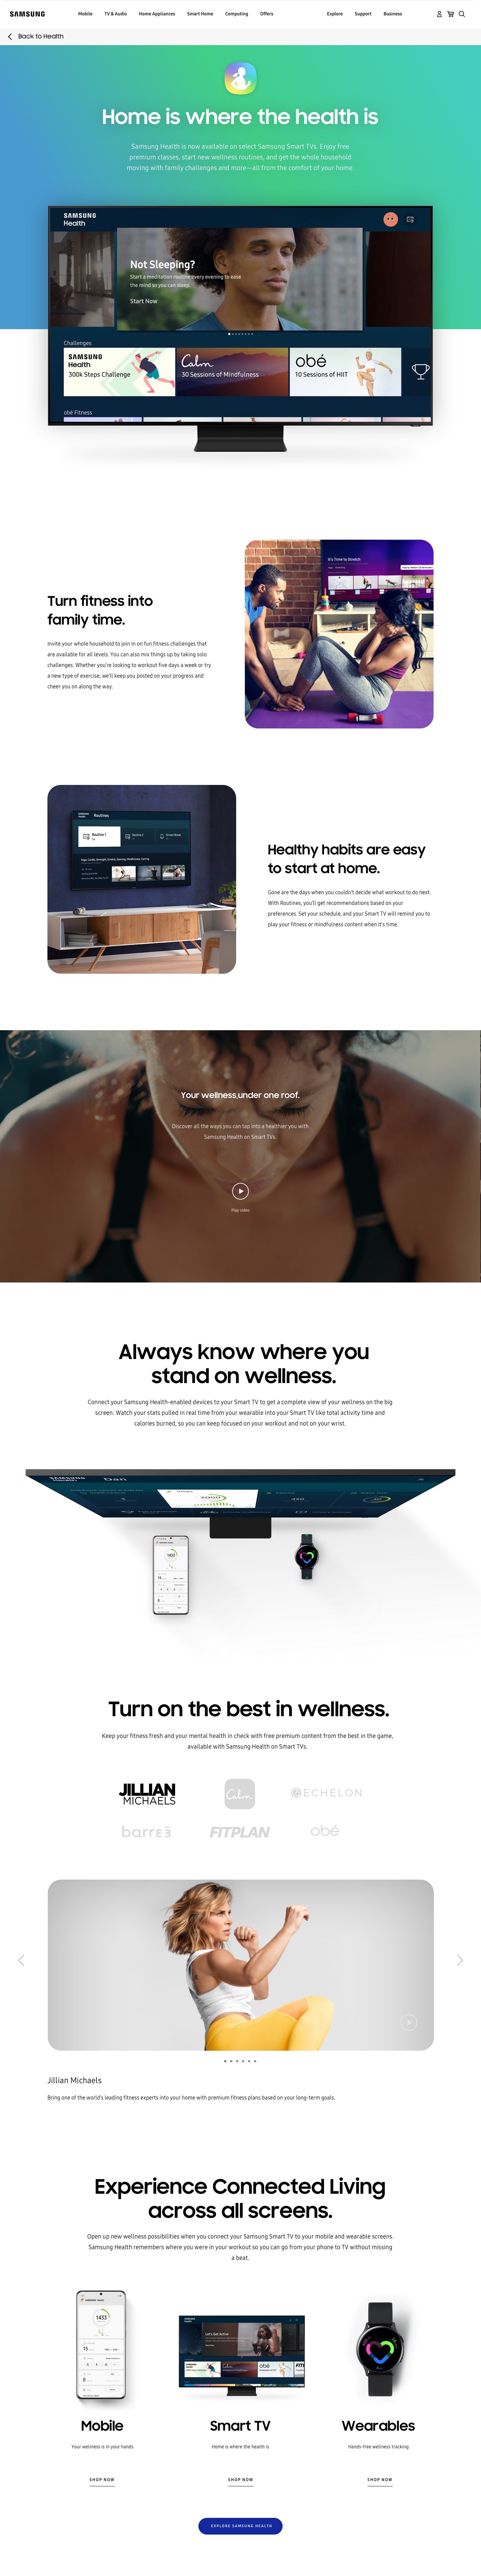 Samsung_Health_TV_Desktop